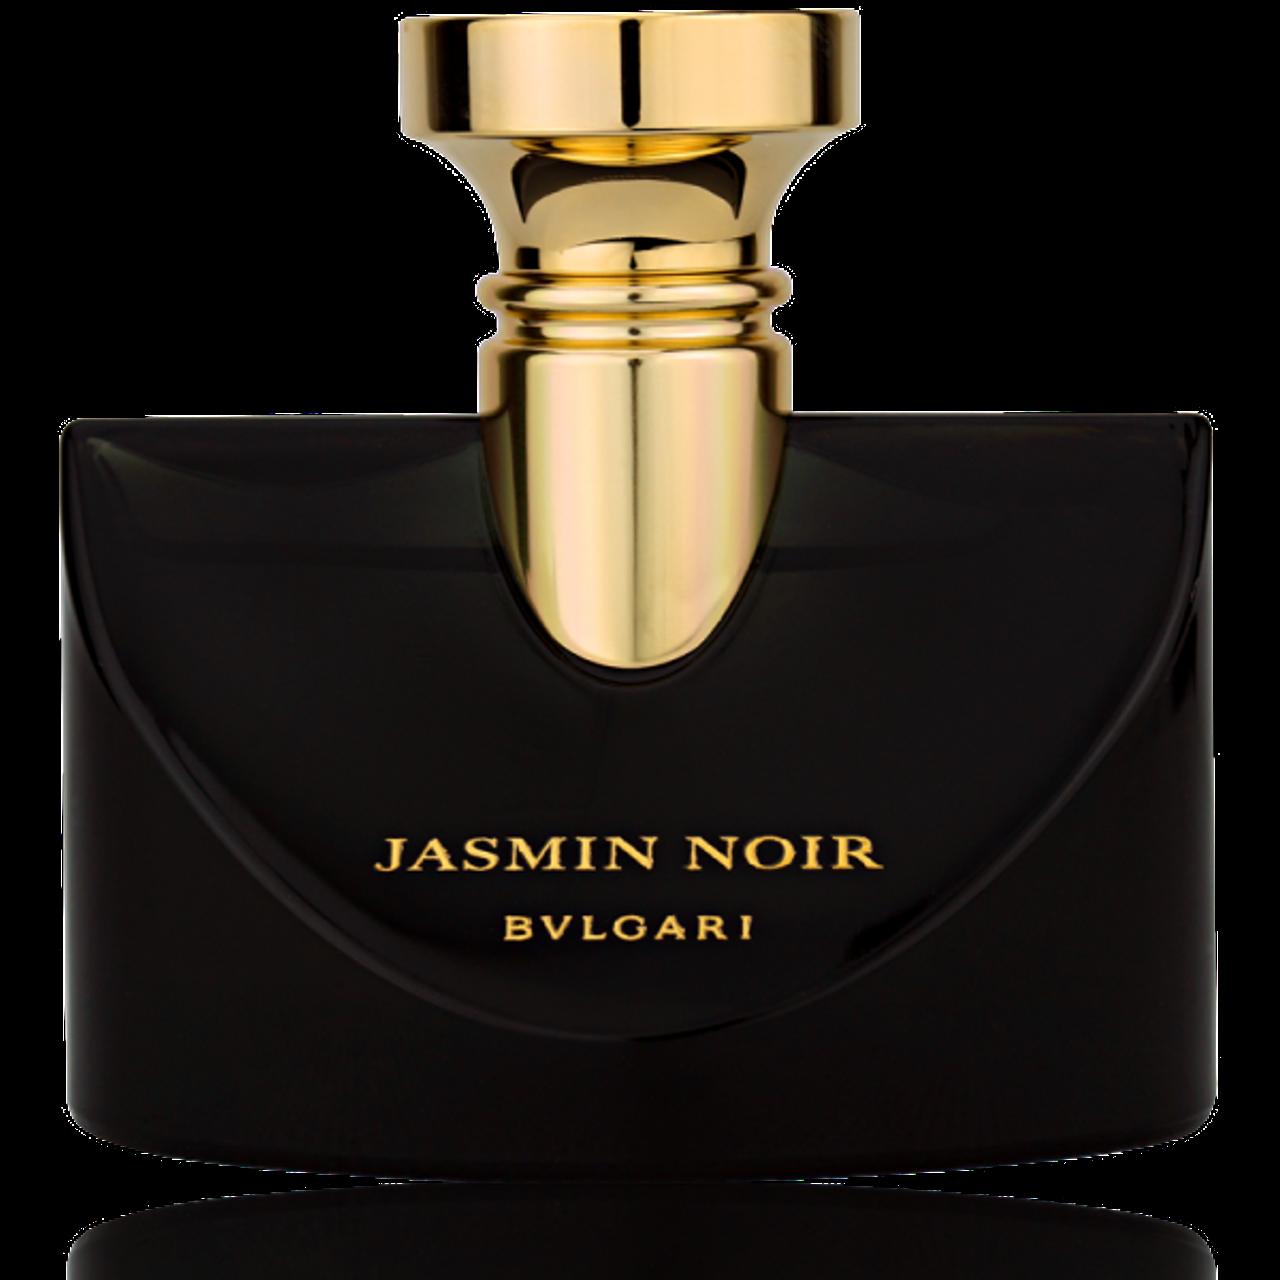 Bvlgari Jasmin Noir EdP 100ml